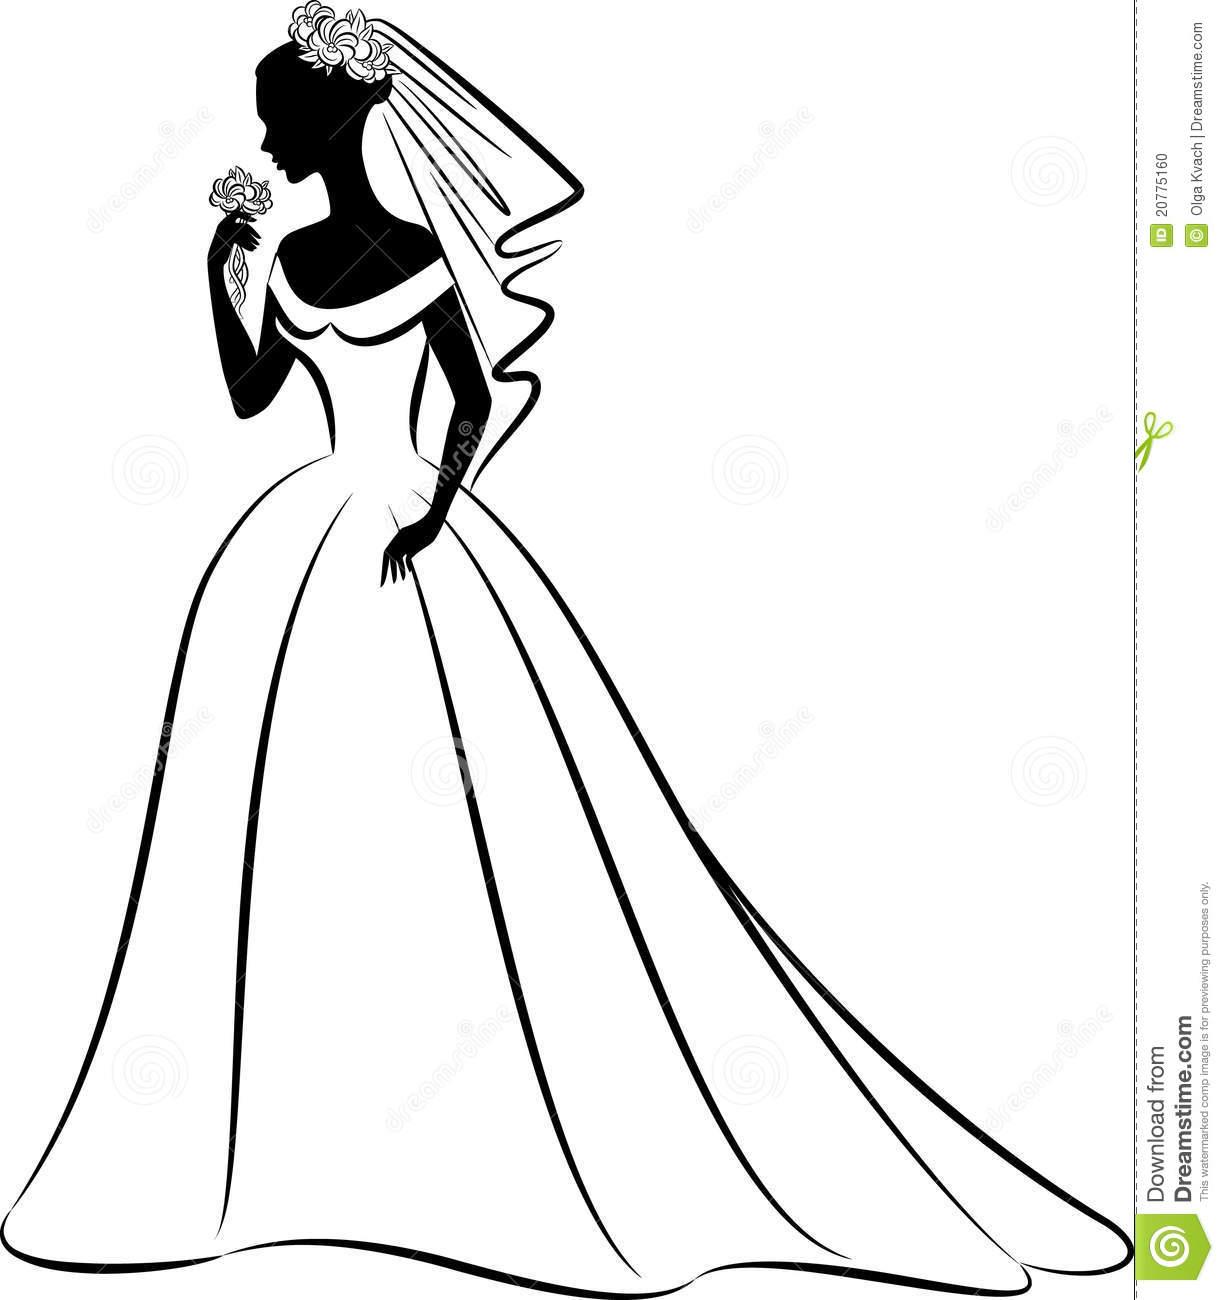 Bride Clip Art Images Free | Clipart Panda - Free Clipart Images